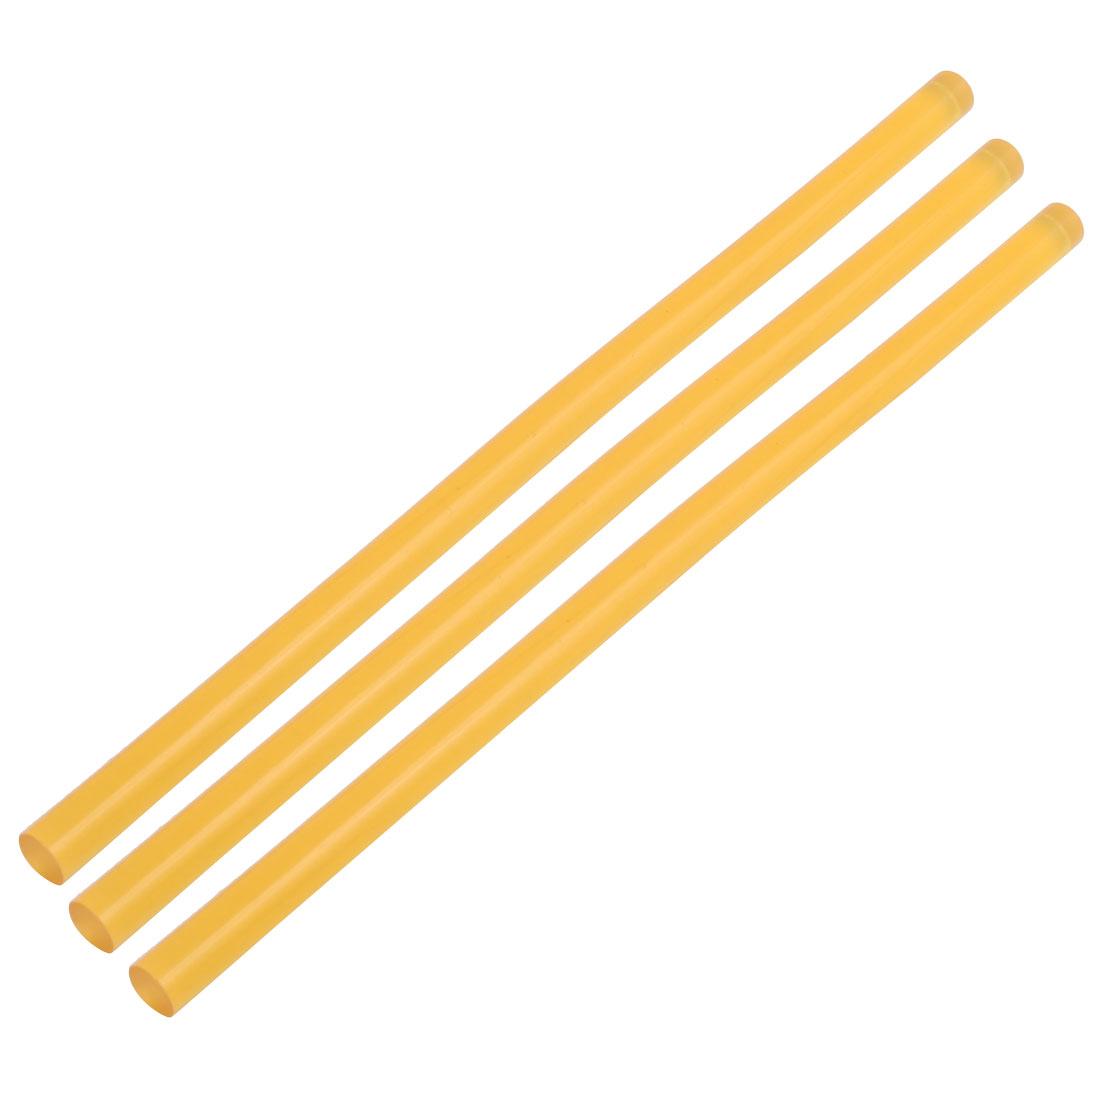 11mmx270mm Heating  Hot Melt Glue Adhesive Stick Yellow 3pcs